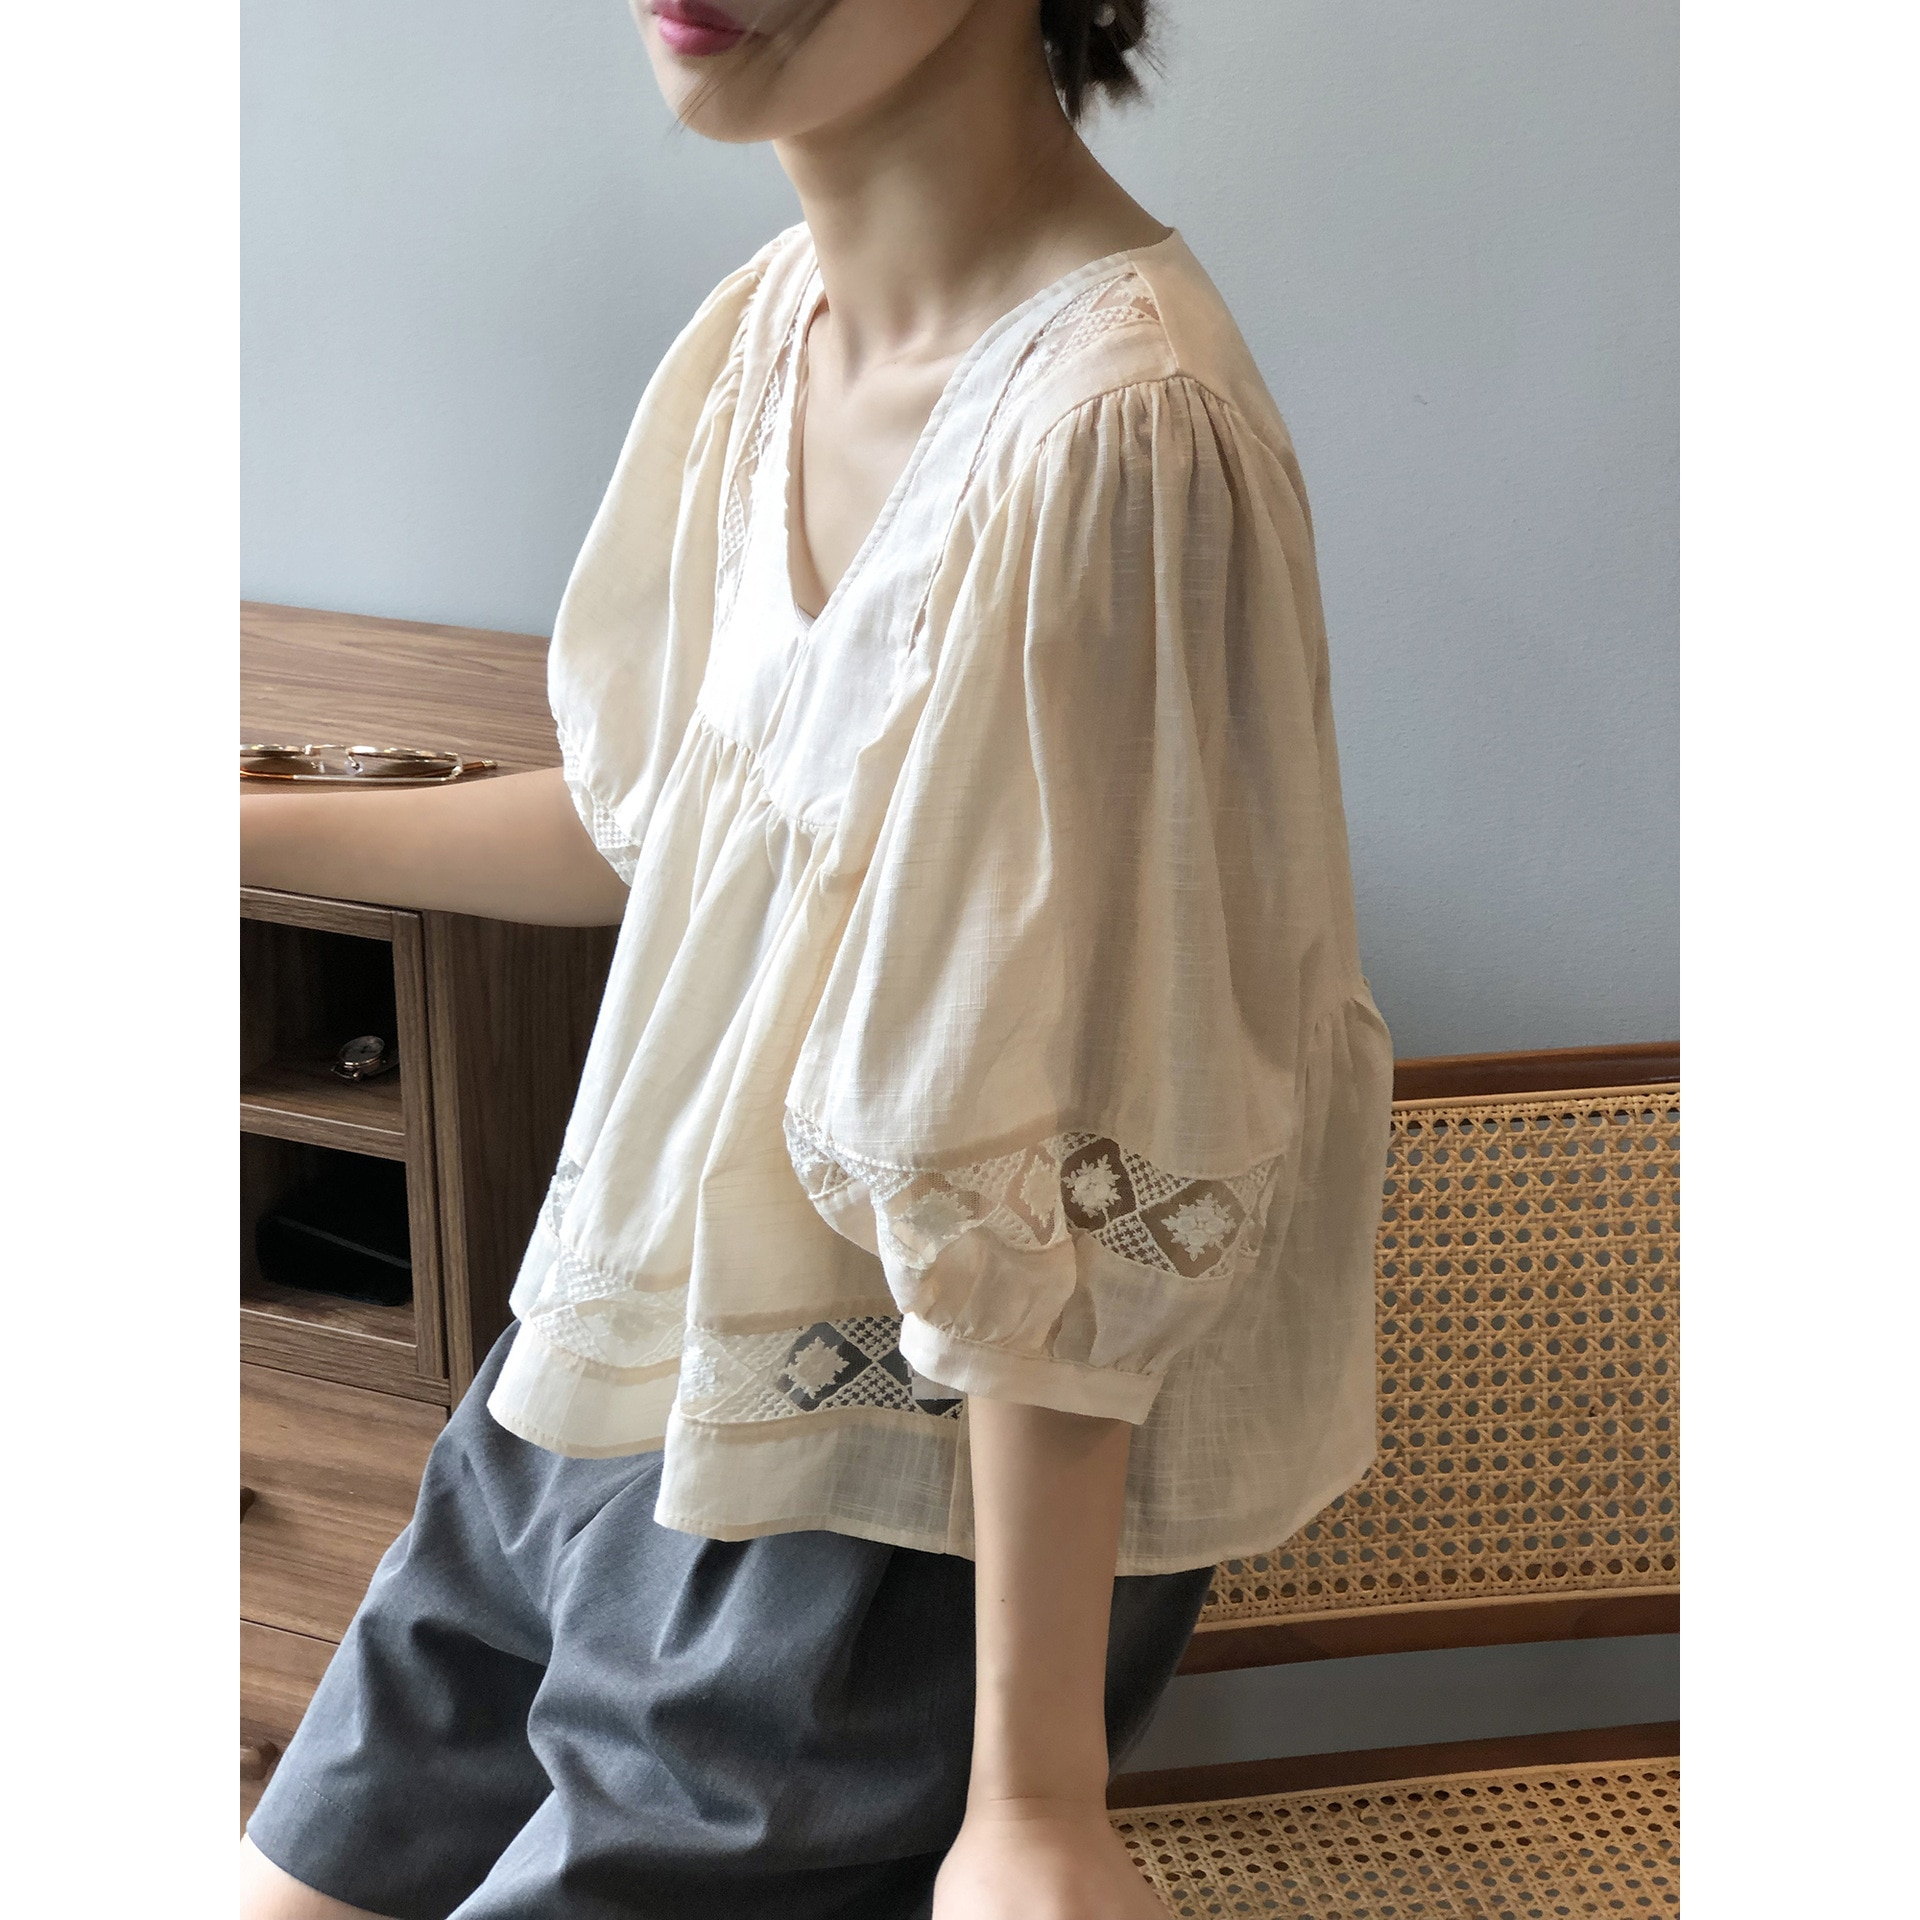 v-neck shirt female summer new lace women loose blouses 0923#